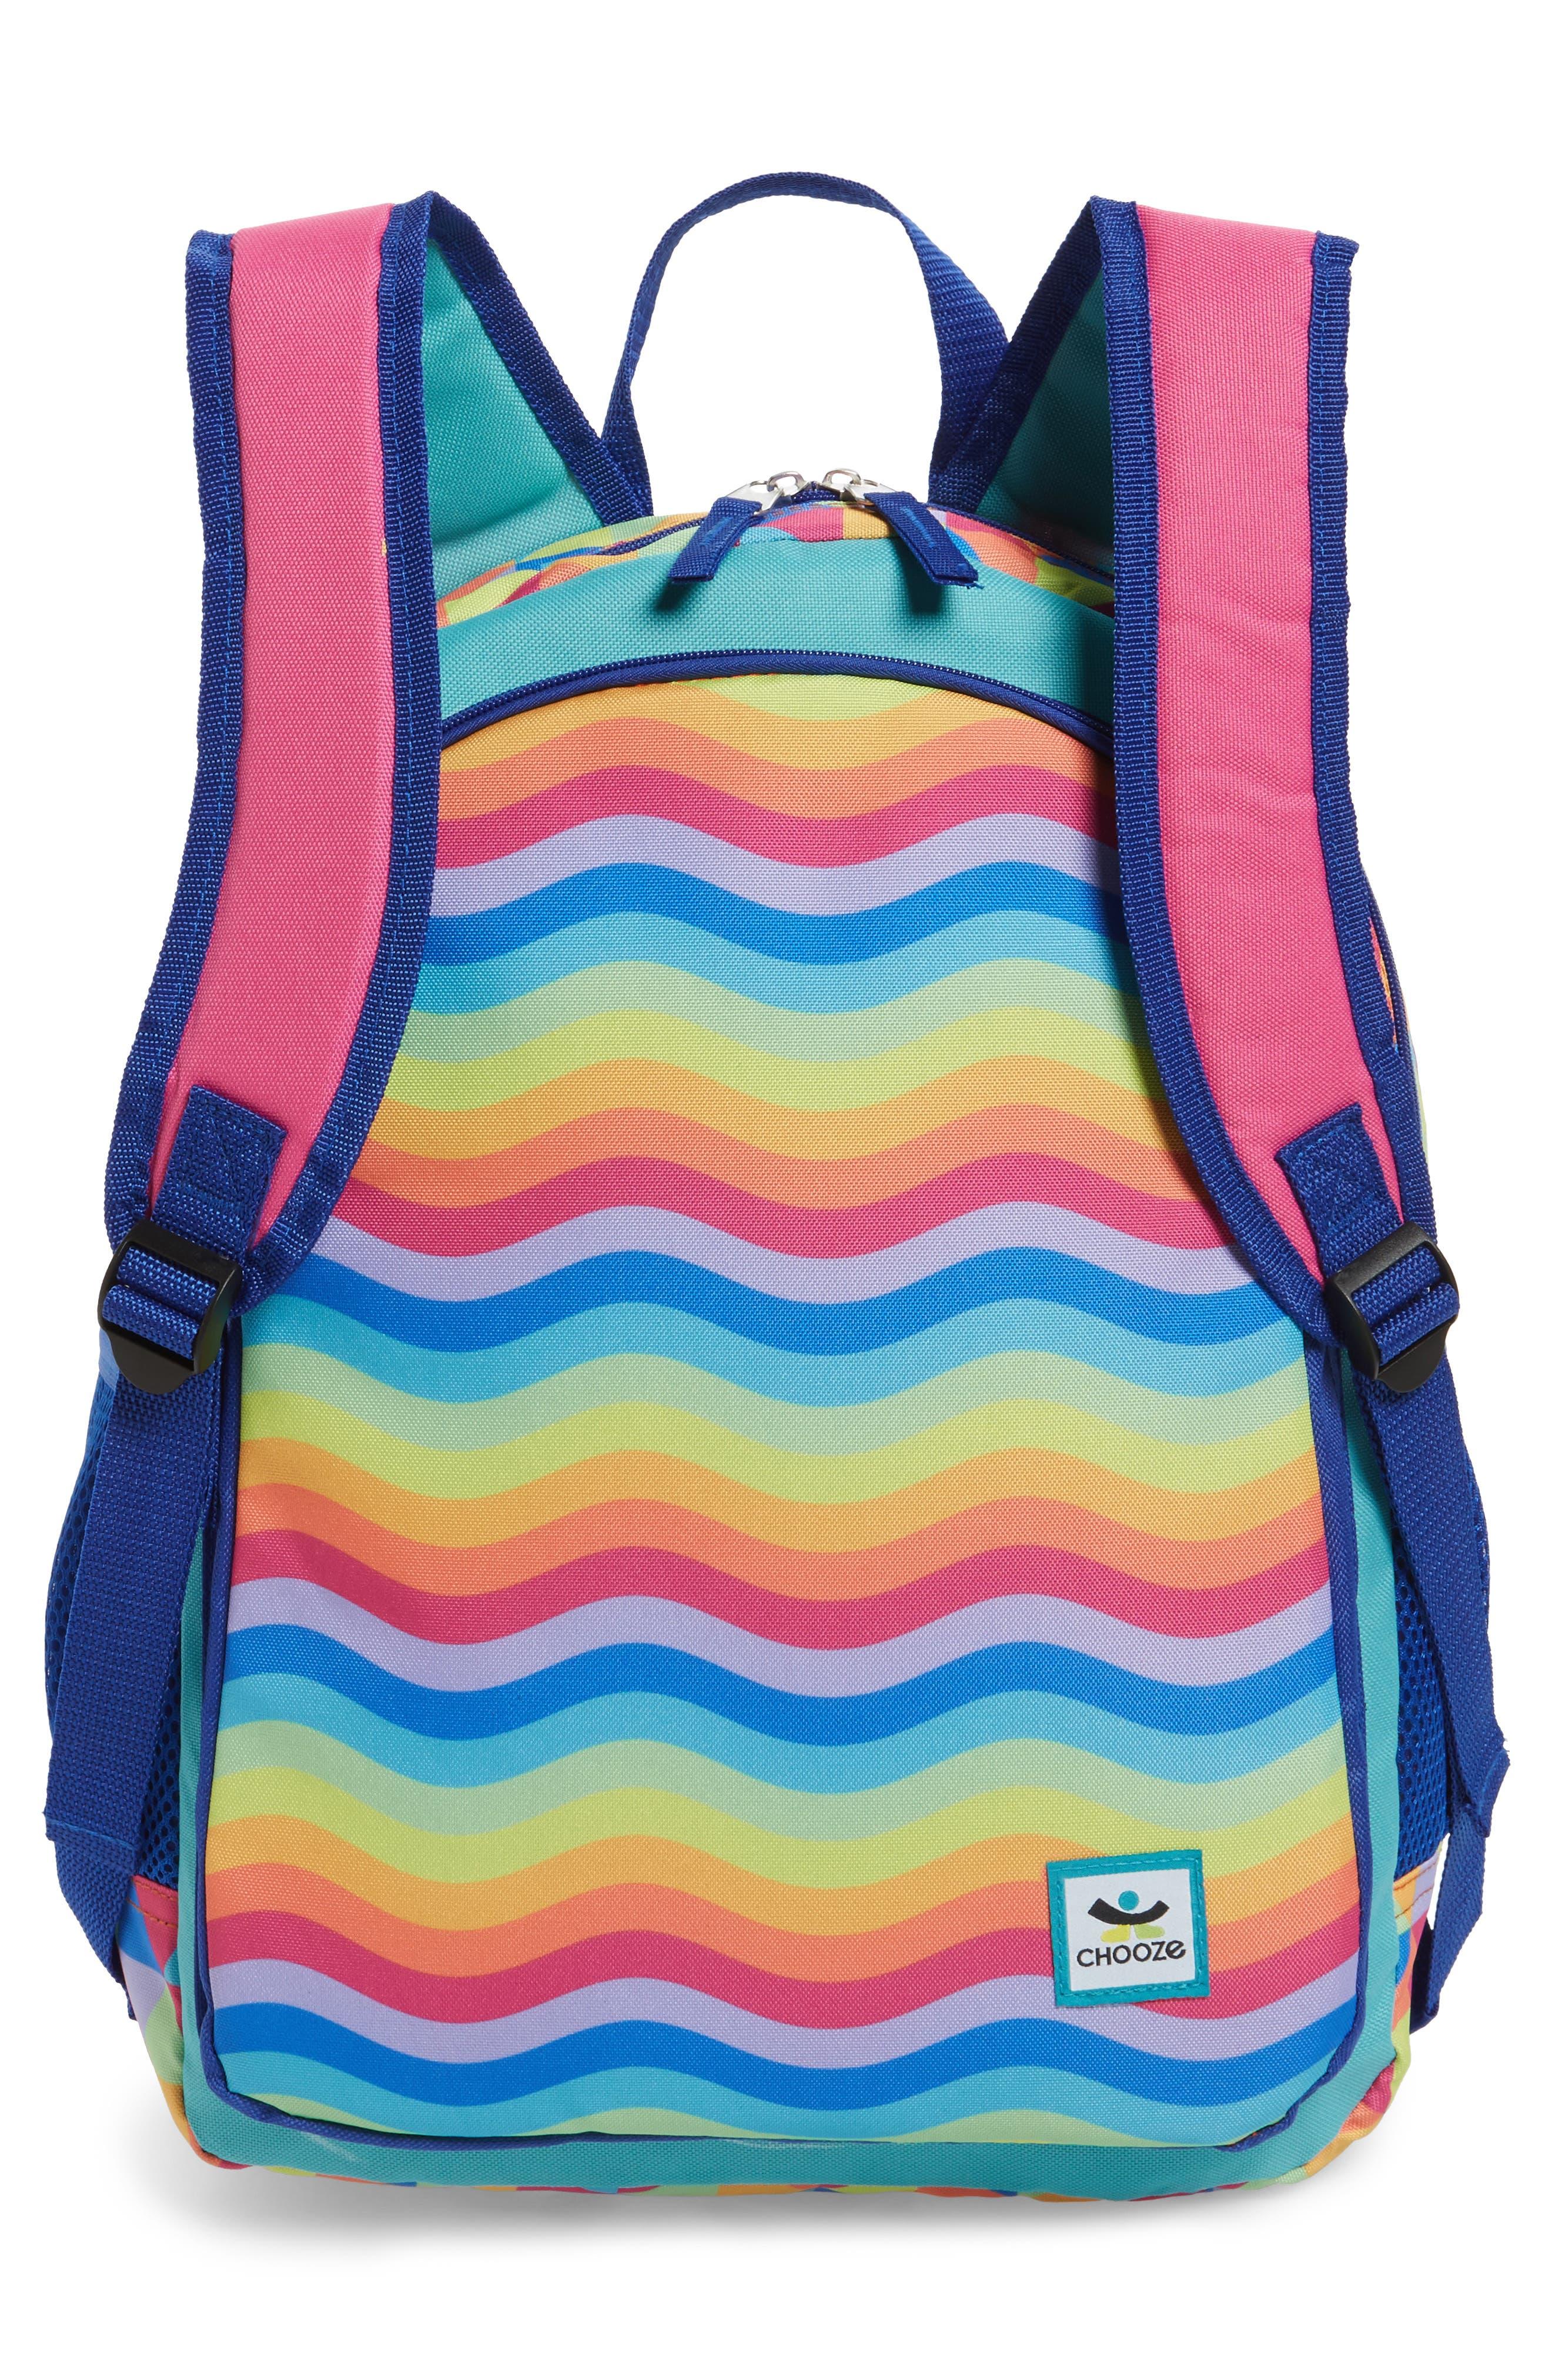 Reversible Backpack,                             Alternate thumbnail 4, color,                             Unity